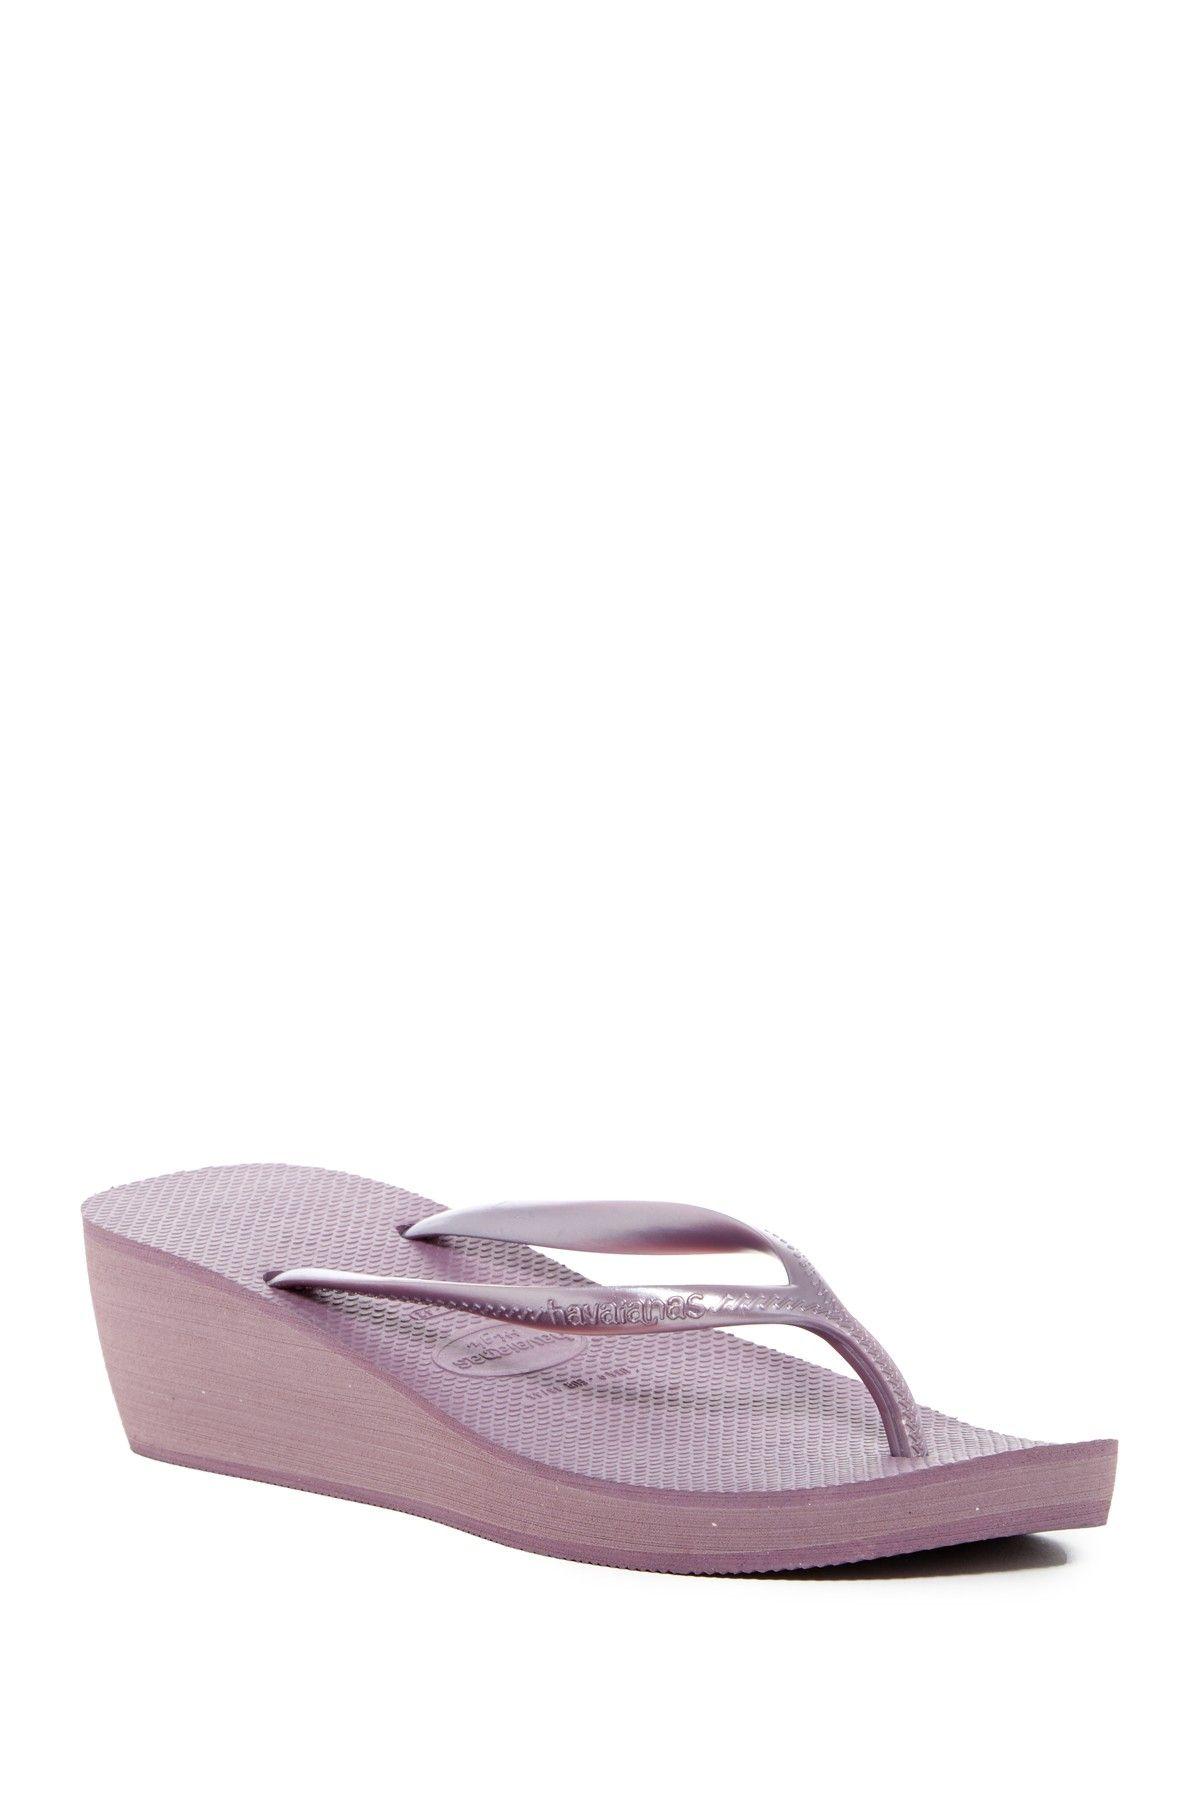 f4812263d Havaianas High Fashion Platform Wedge Flip Flop Sandal (Women ...